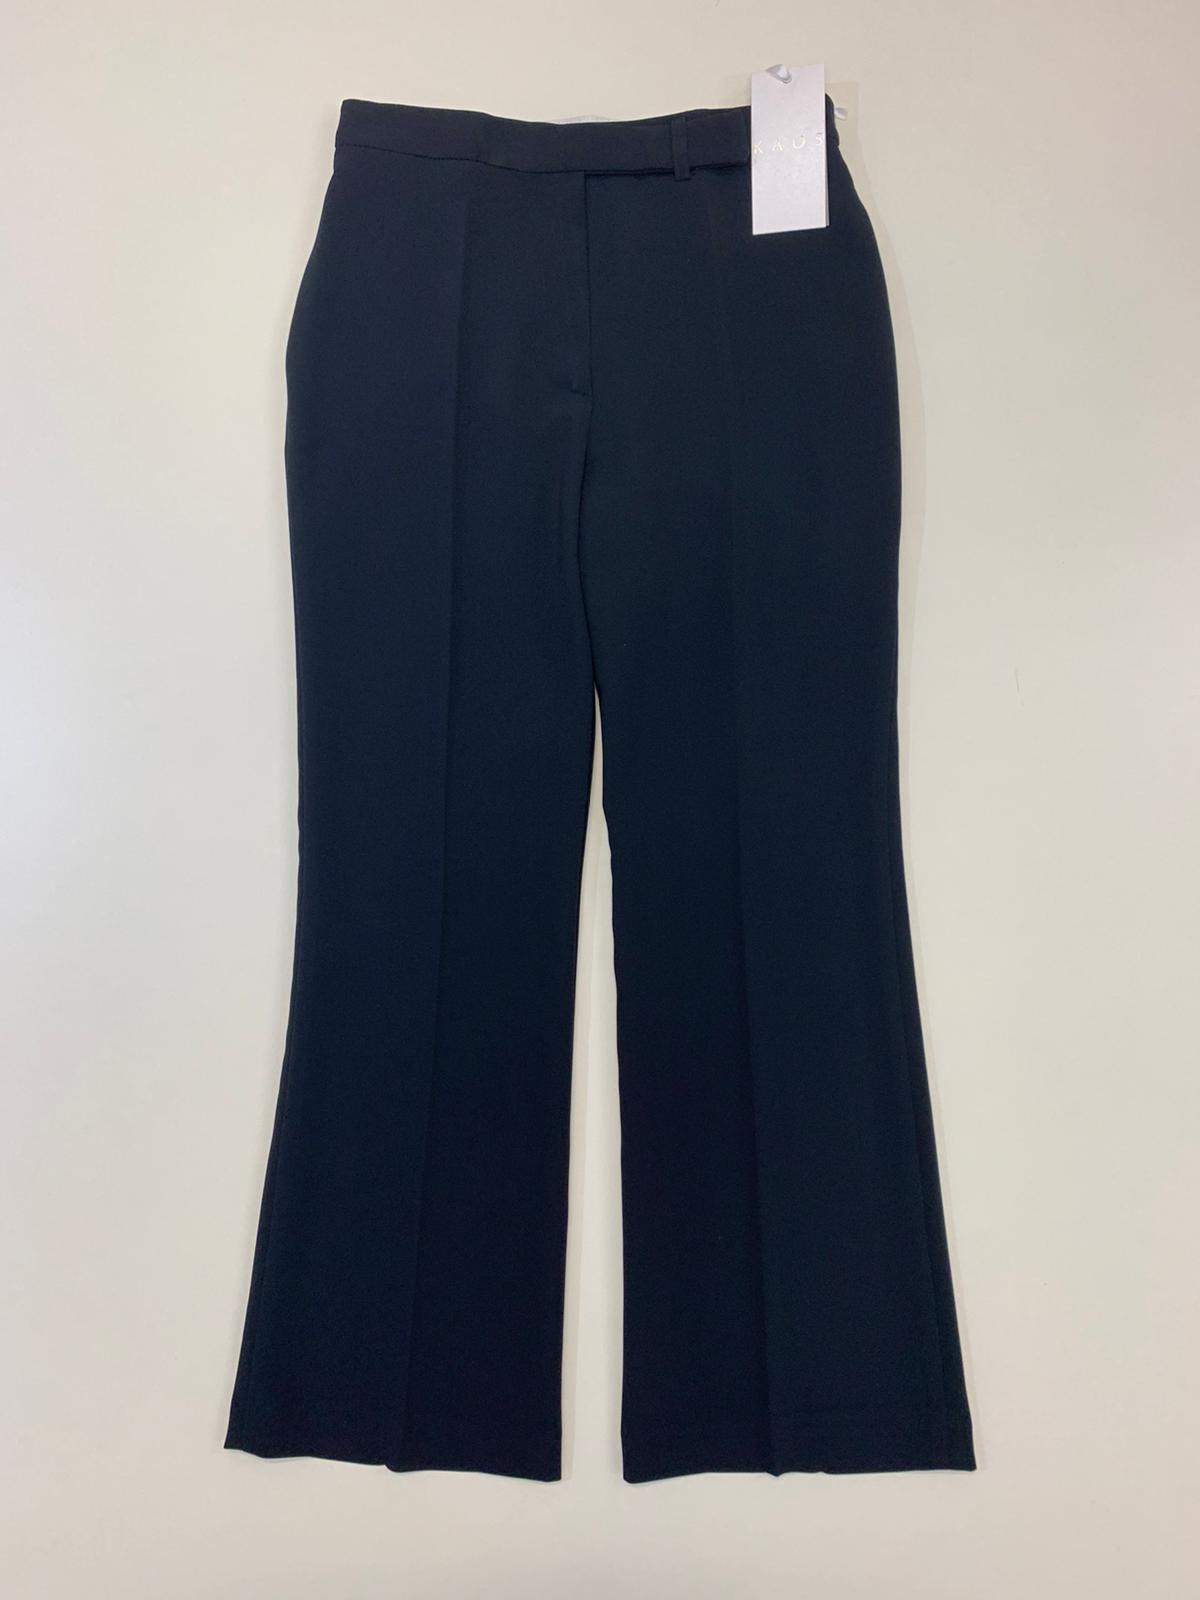 Pantalone Donna Kaos Collection Trombetta Blu